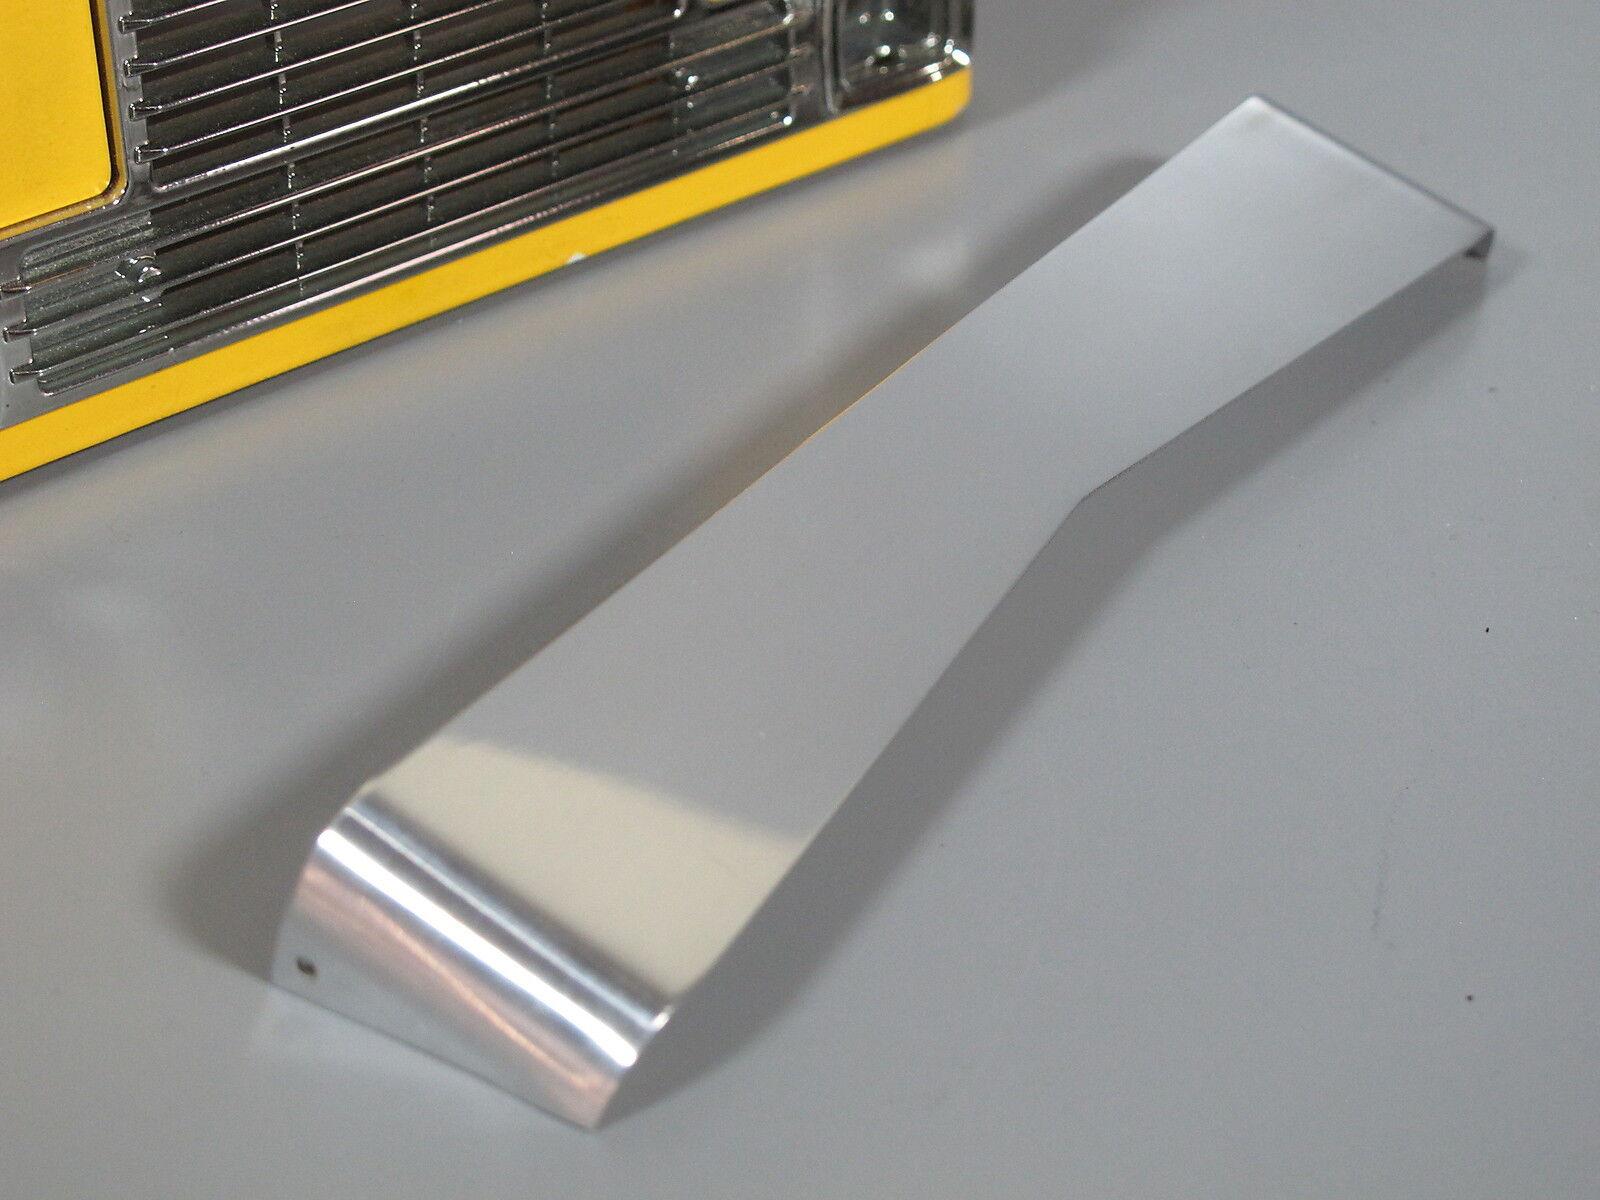 New Alum Front Lowrider Bowtie Sun Sun Sun Visor Plate Tamiya R C 1 14 GlobeLiner Semi a66bb8